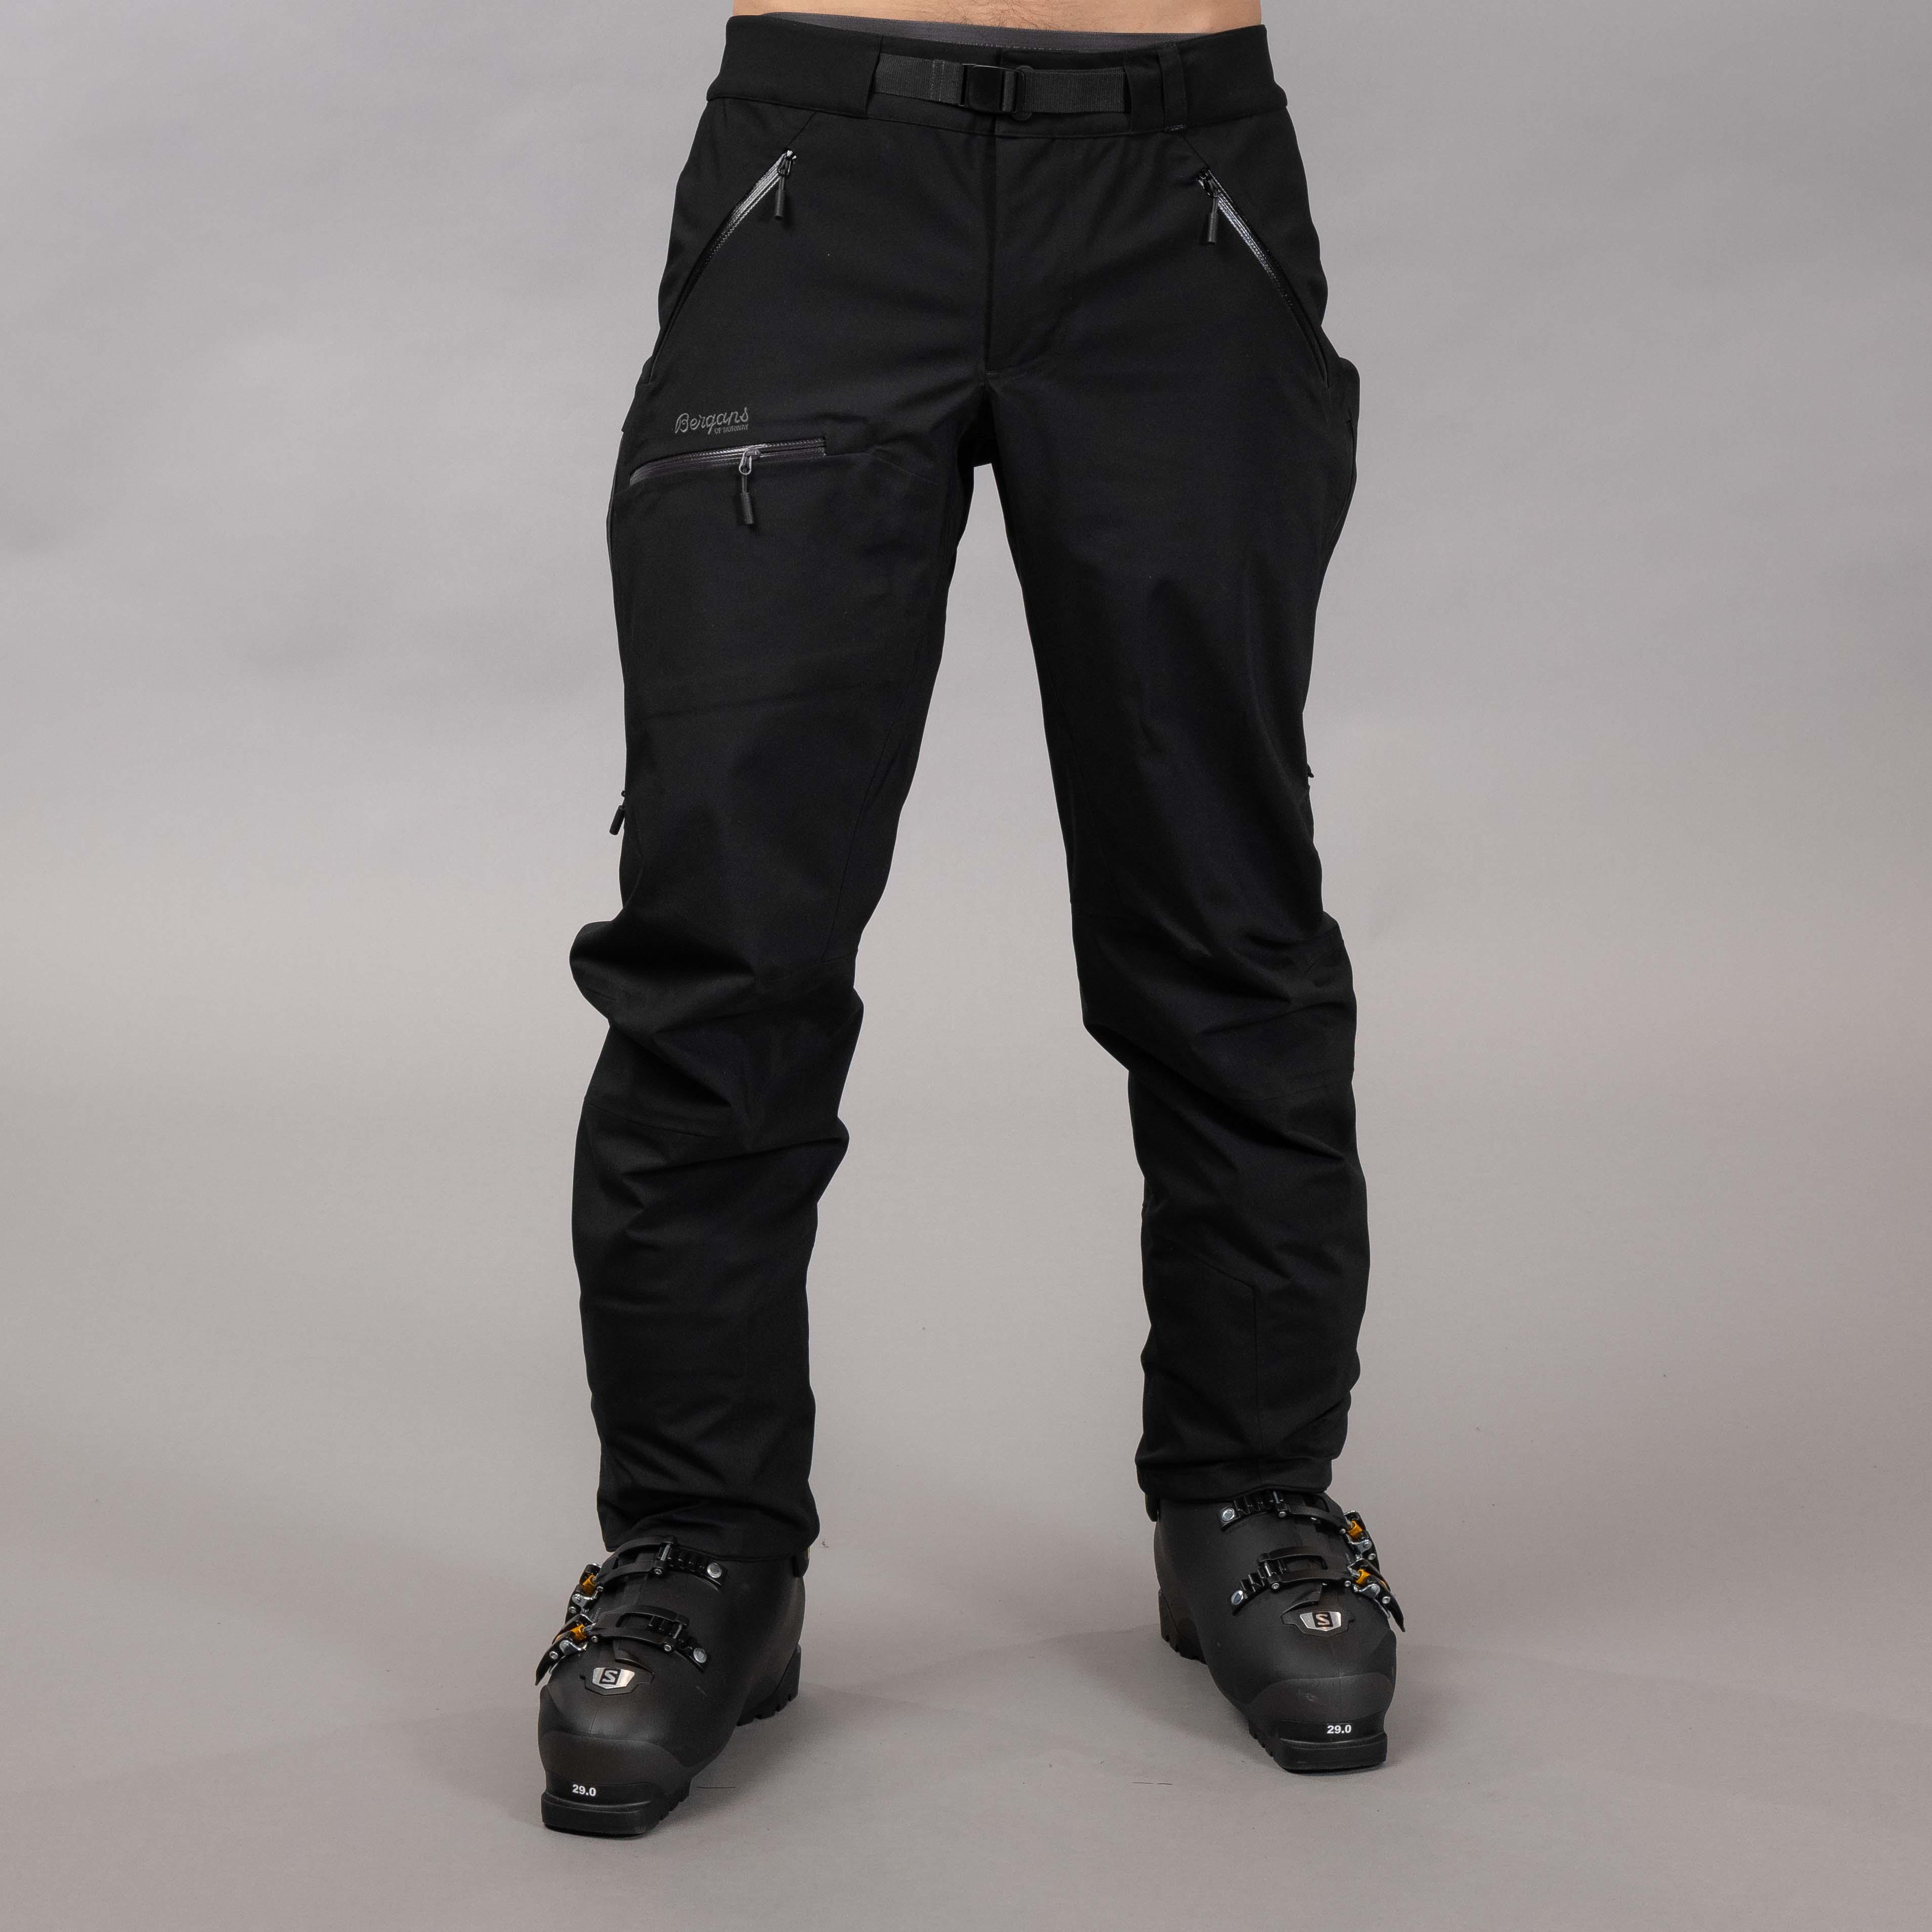 Breheimen 3L Pants